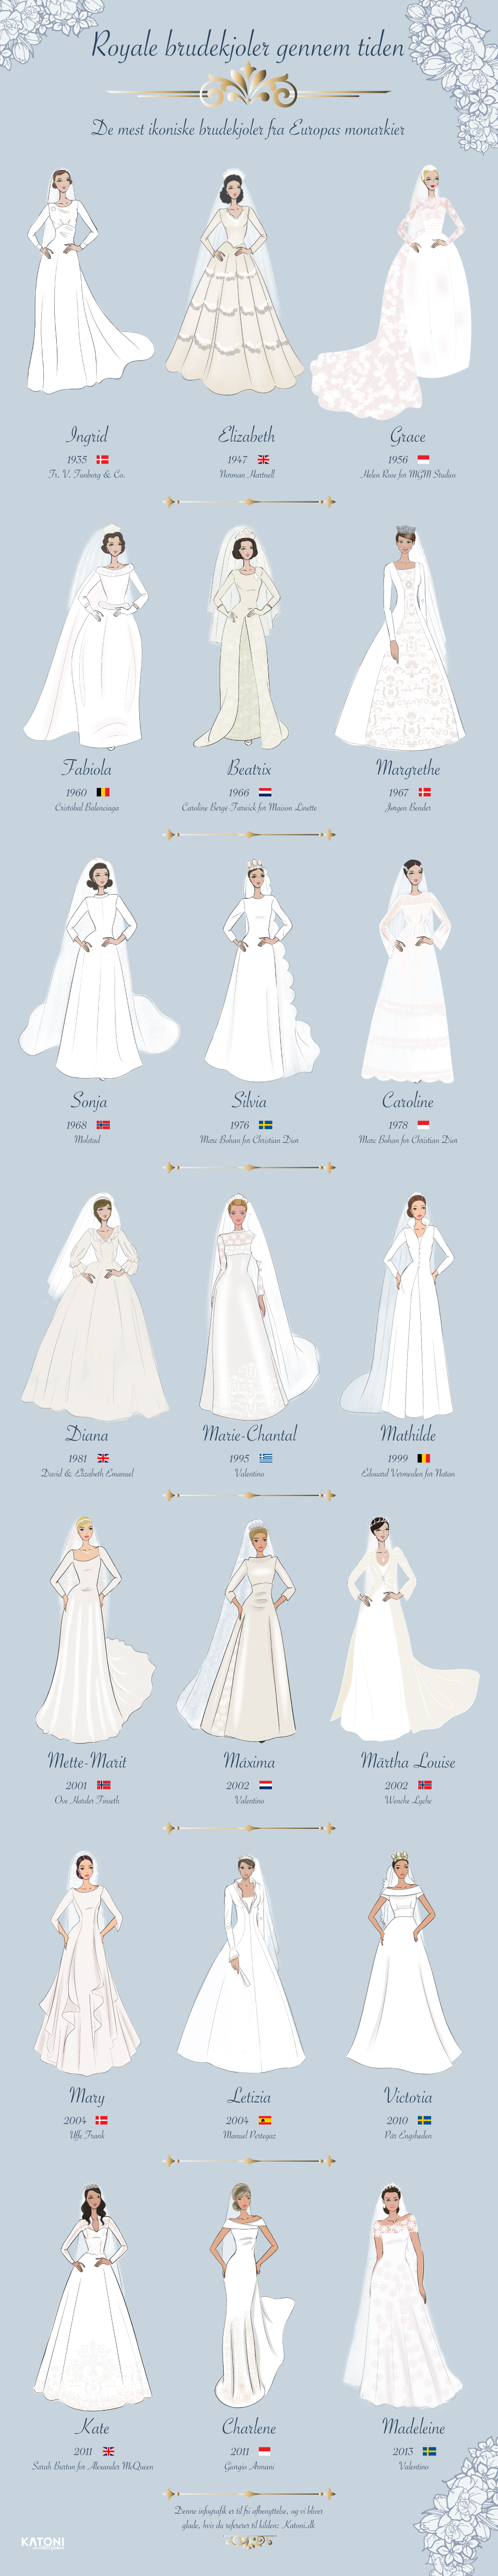 royale-brudekjoler.jpg